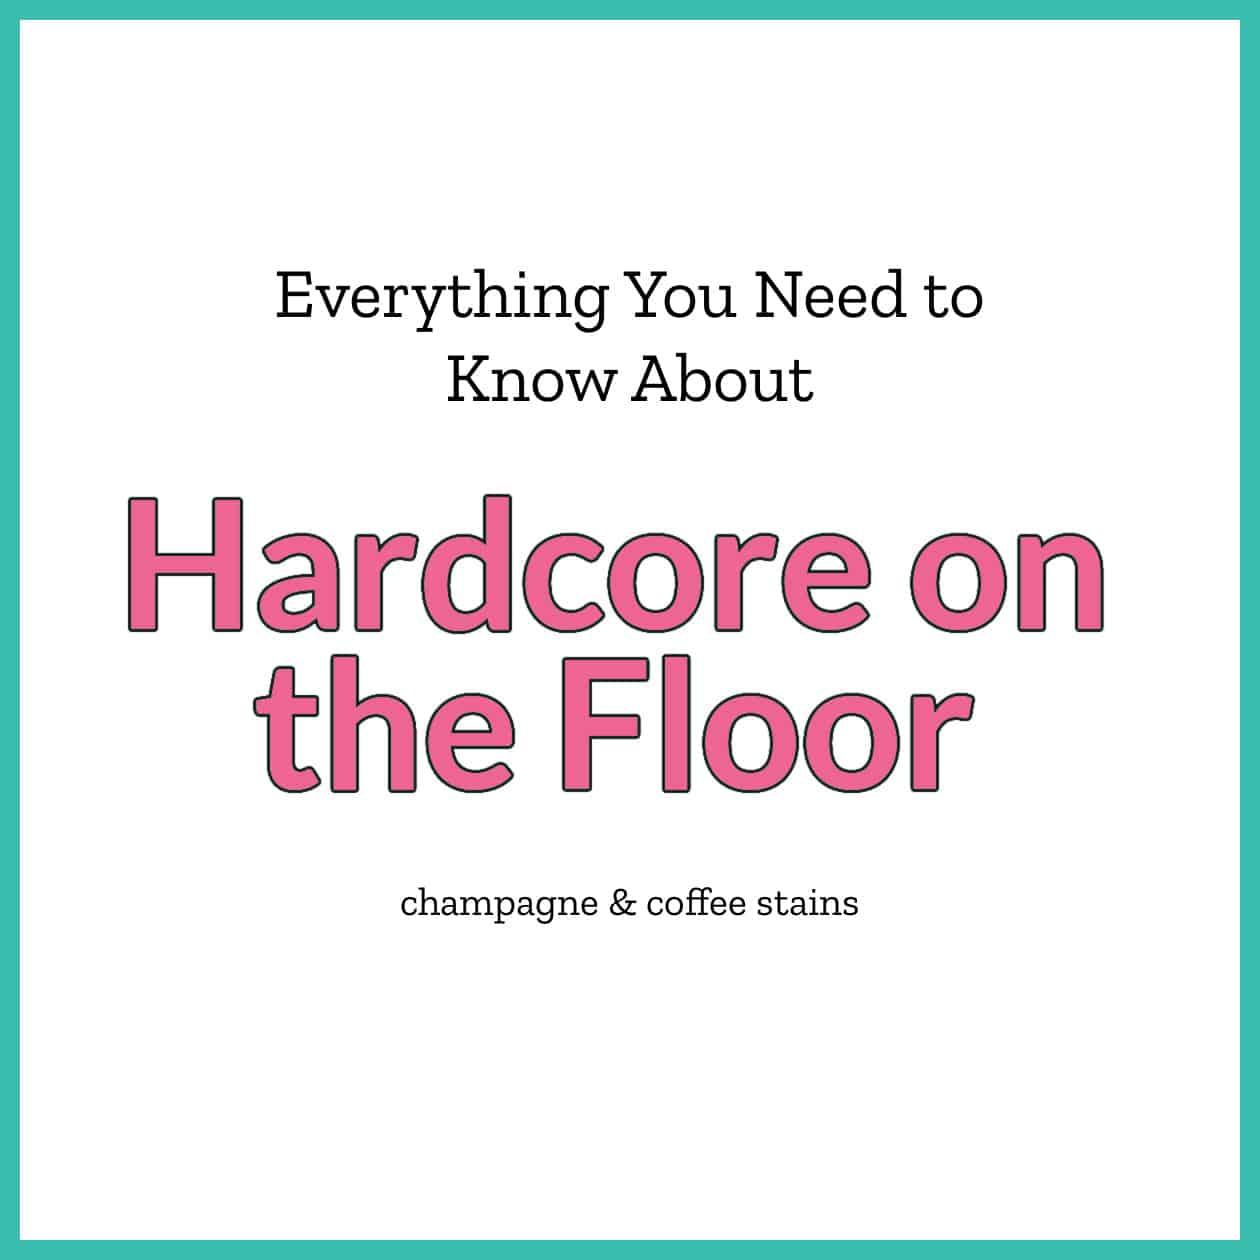 hardcore on the floor blog image